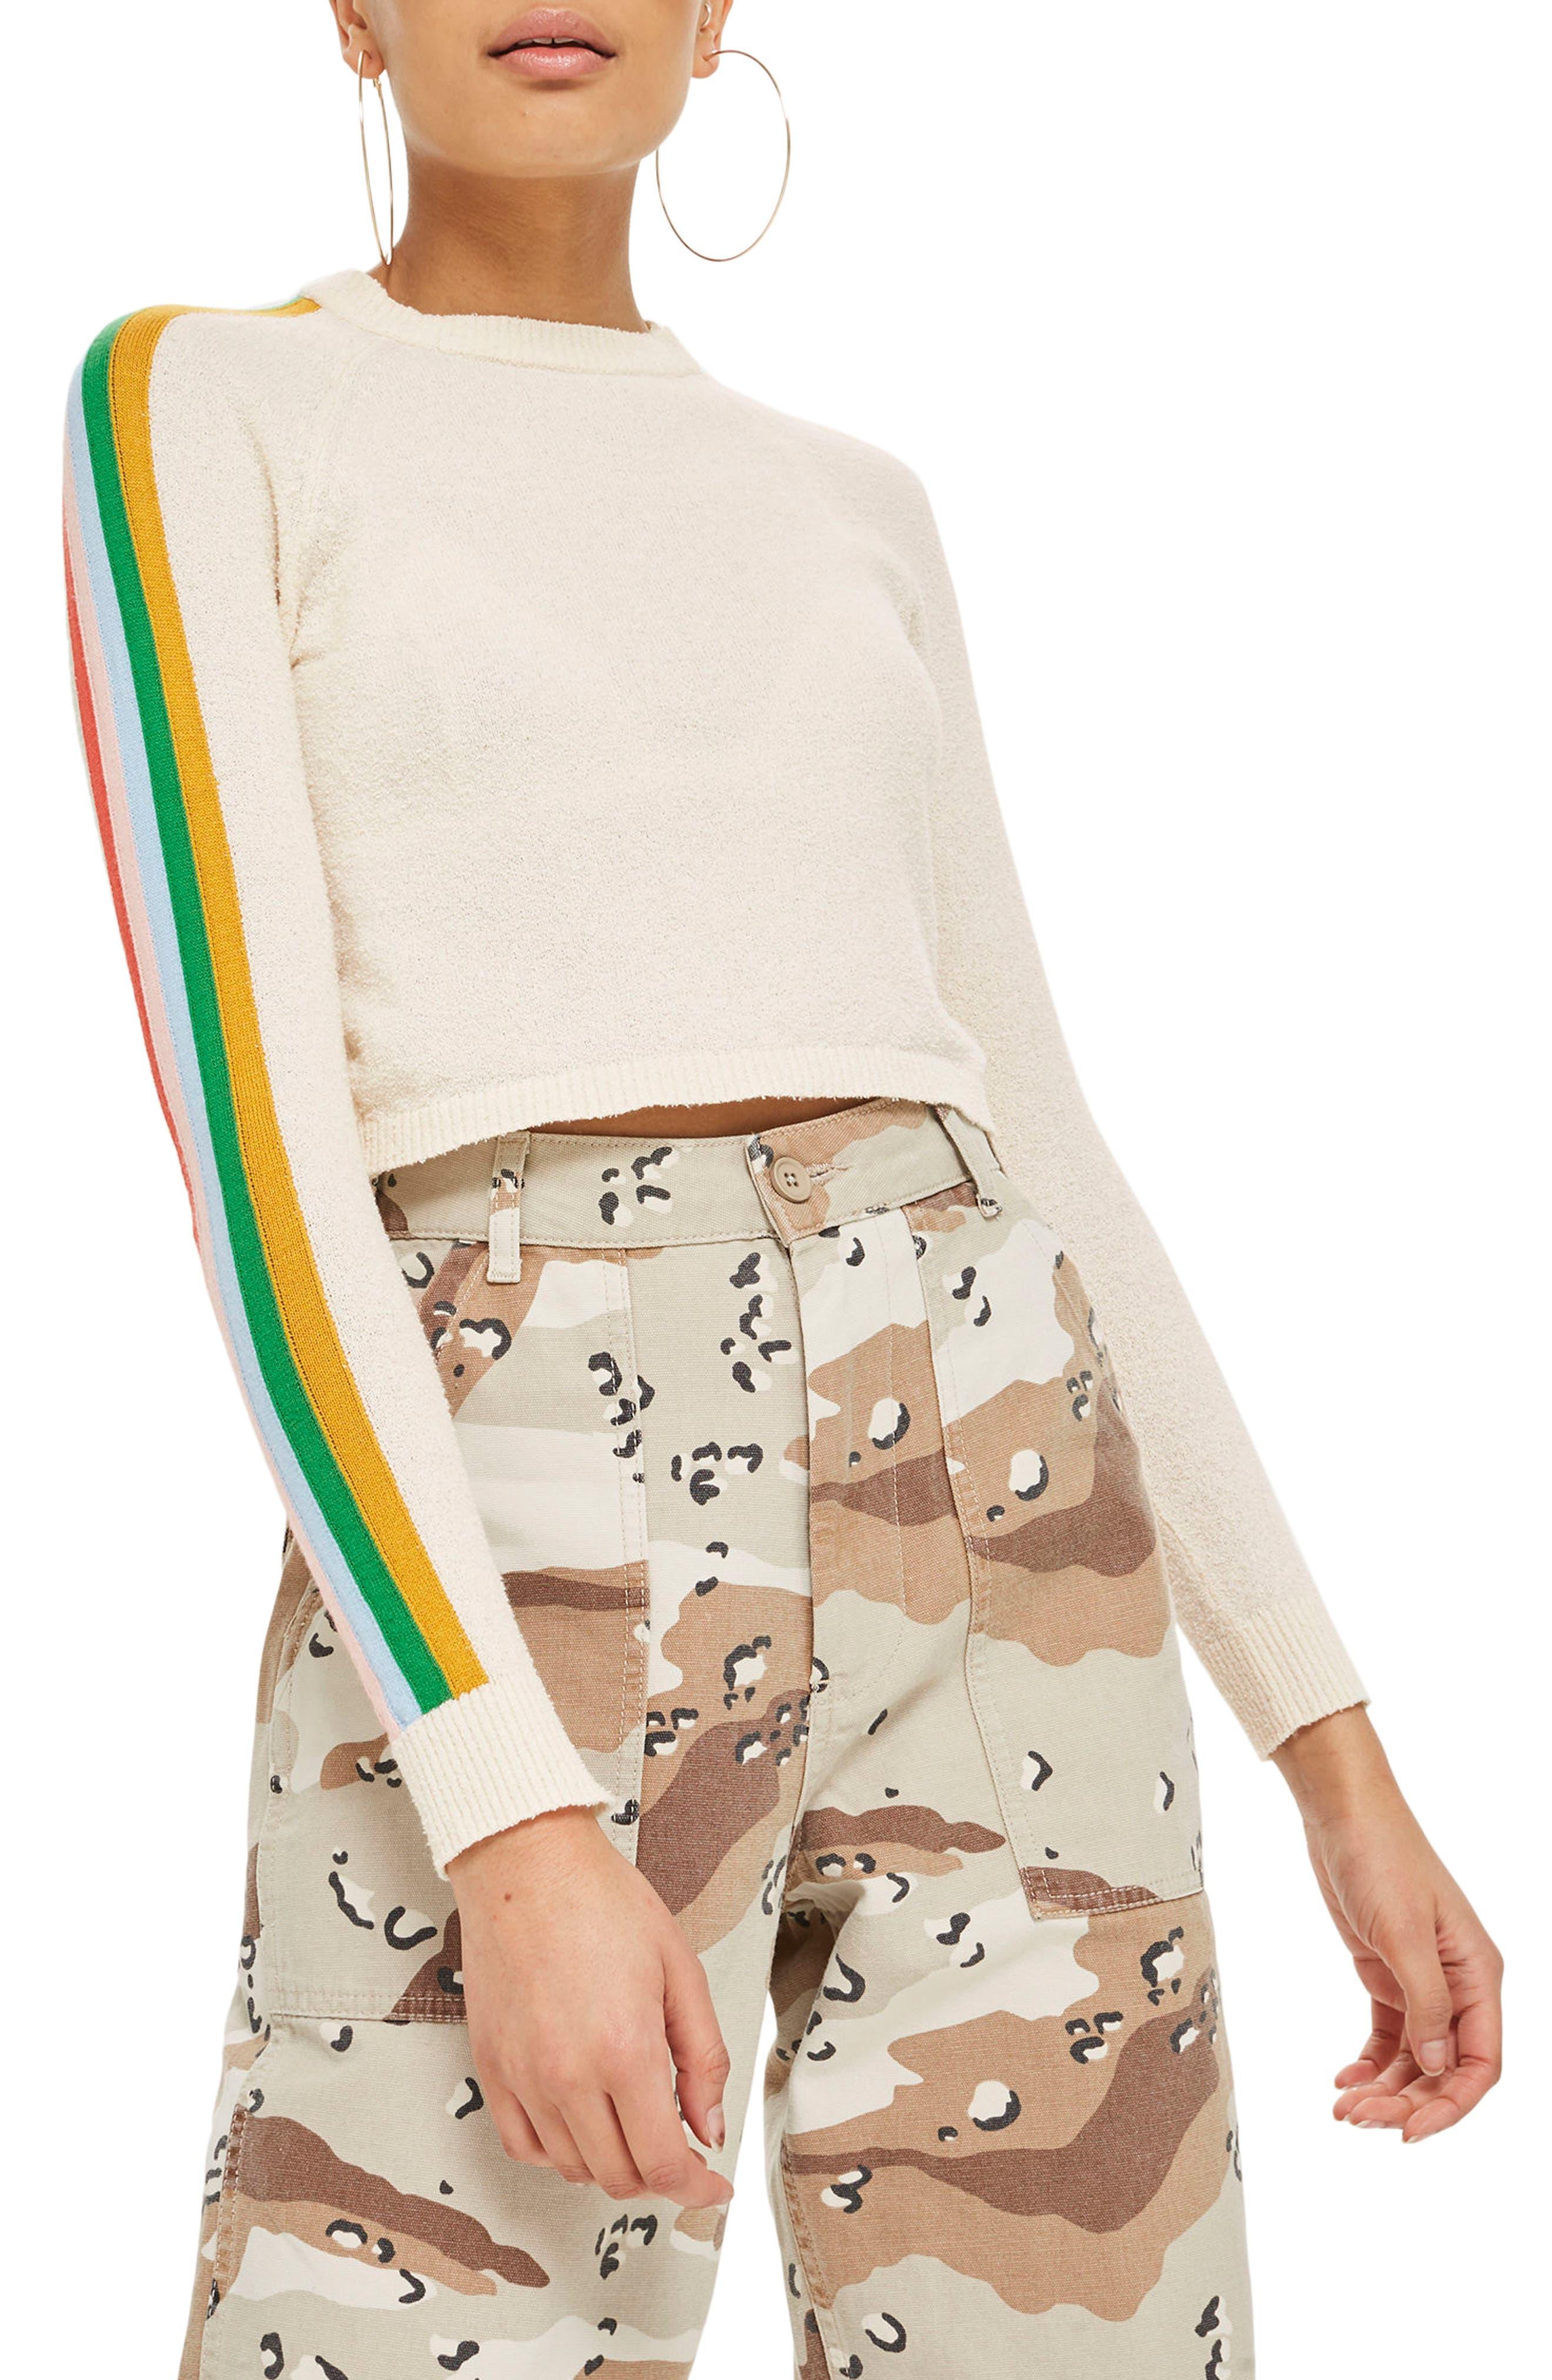 Rainbow Sleeve Knit Top,                             Main thumbnail 1, color,                             Cream Multi